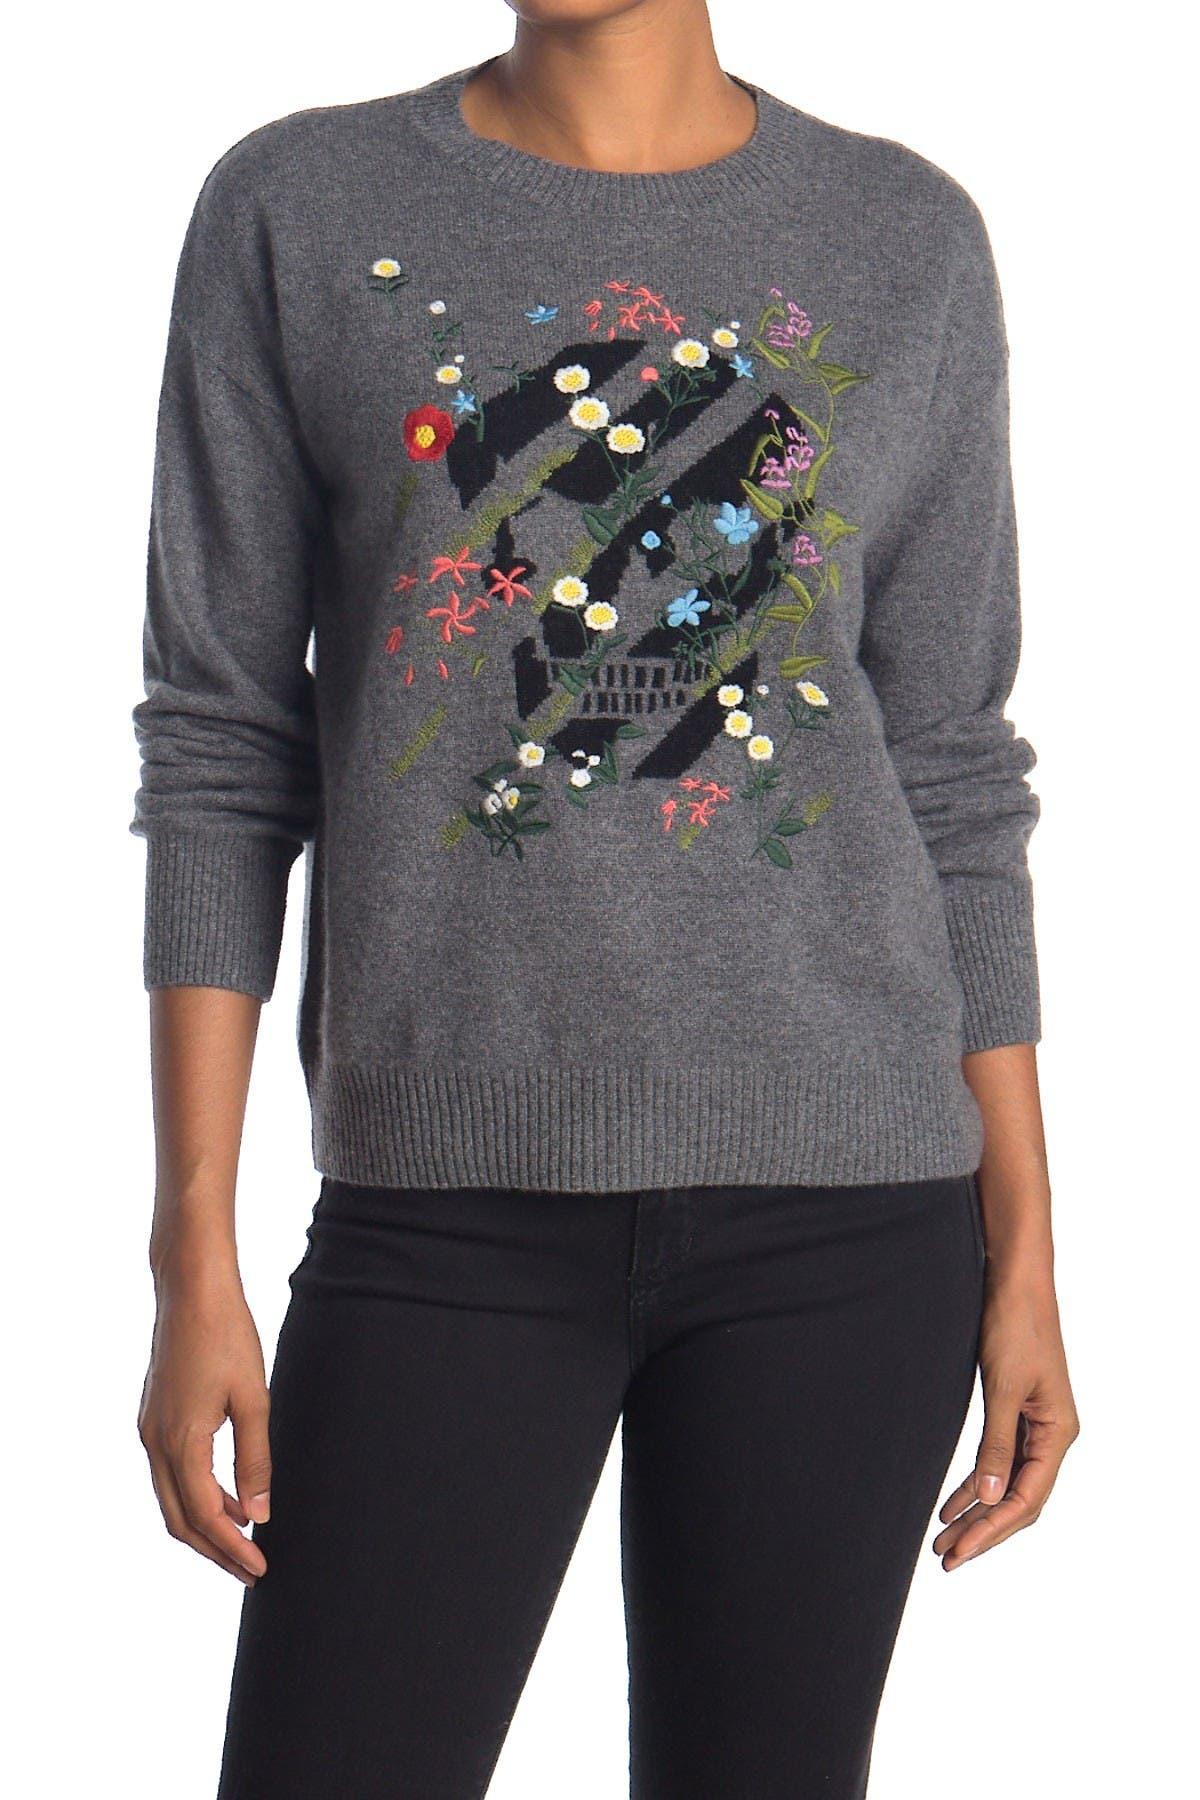 Image of SKULL CASHMERE Aji Floral Skull Print Cashmere Crew Neck Sweater